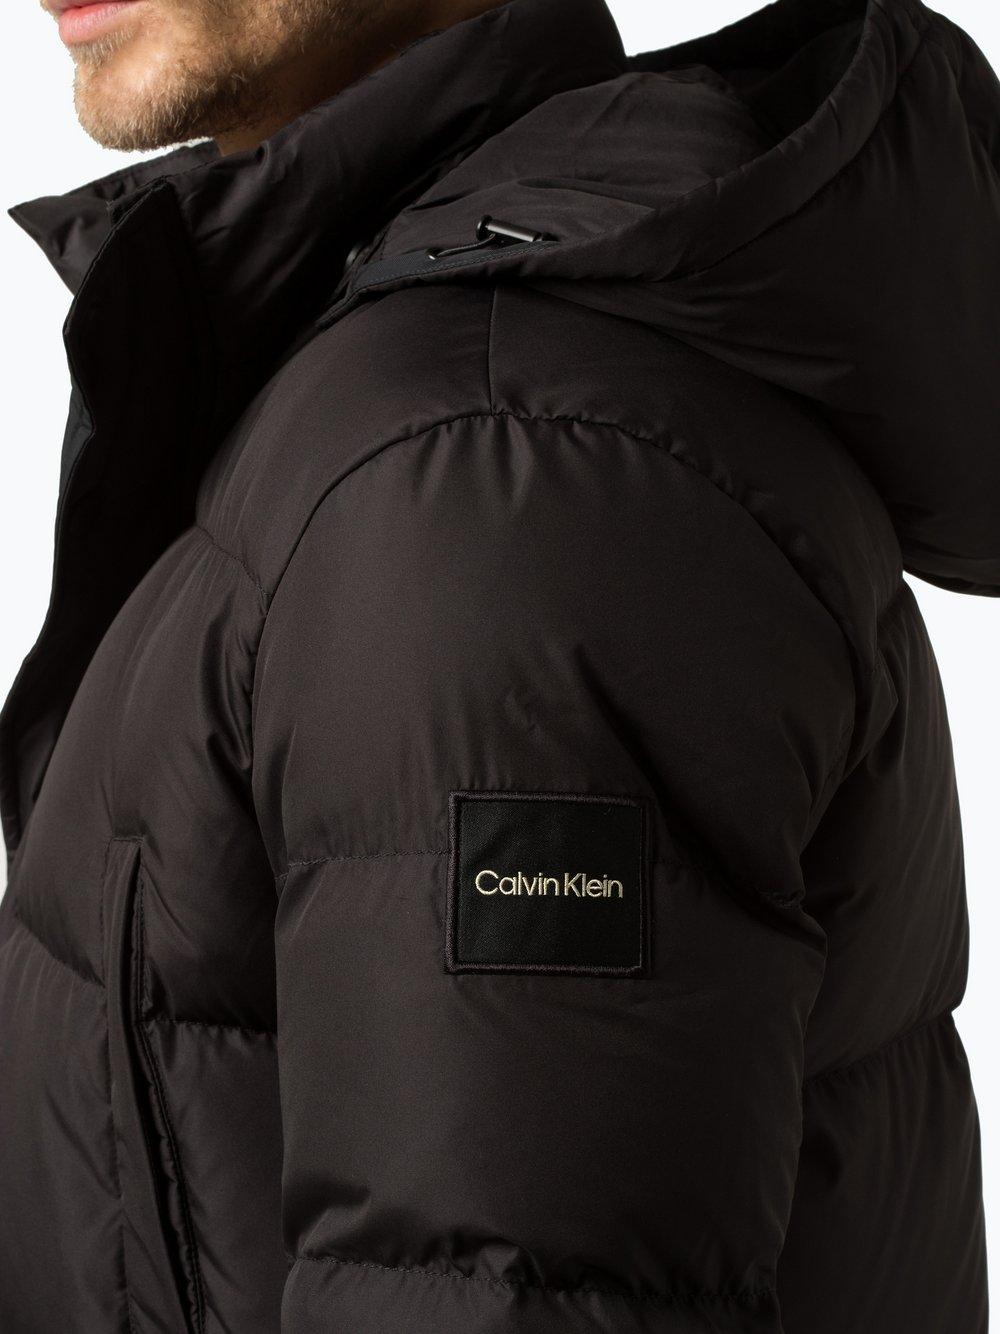 Męska kurtka puchowa Calvin Klein